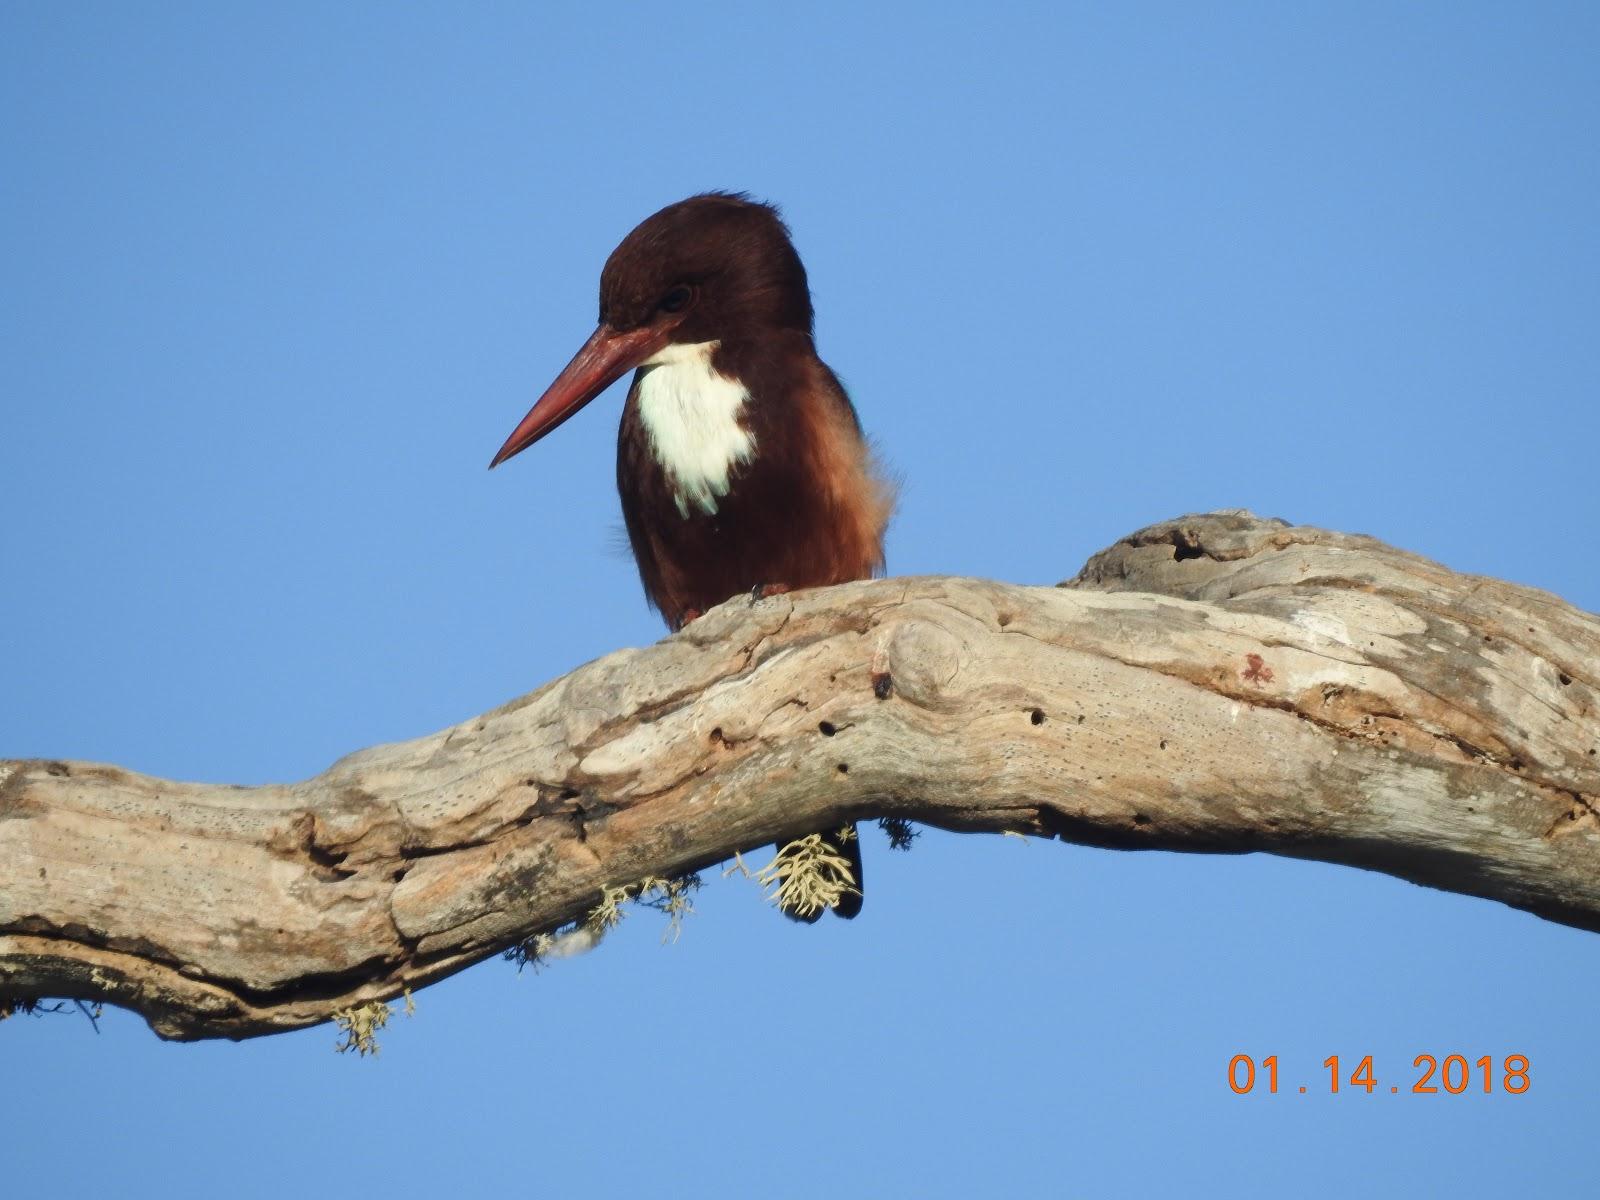 invite-to-paradise-sri-lanka-maldives-holiday-specialists-nutan-vidyut-patel-kingfisher.jpg